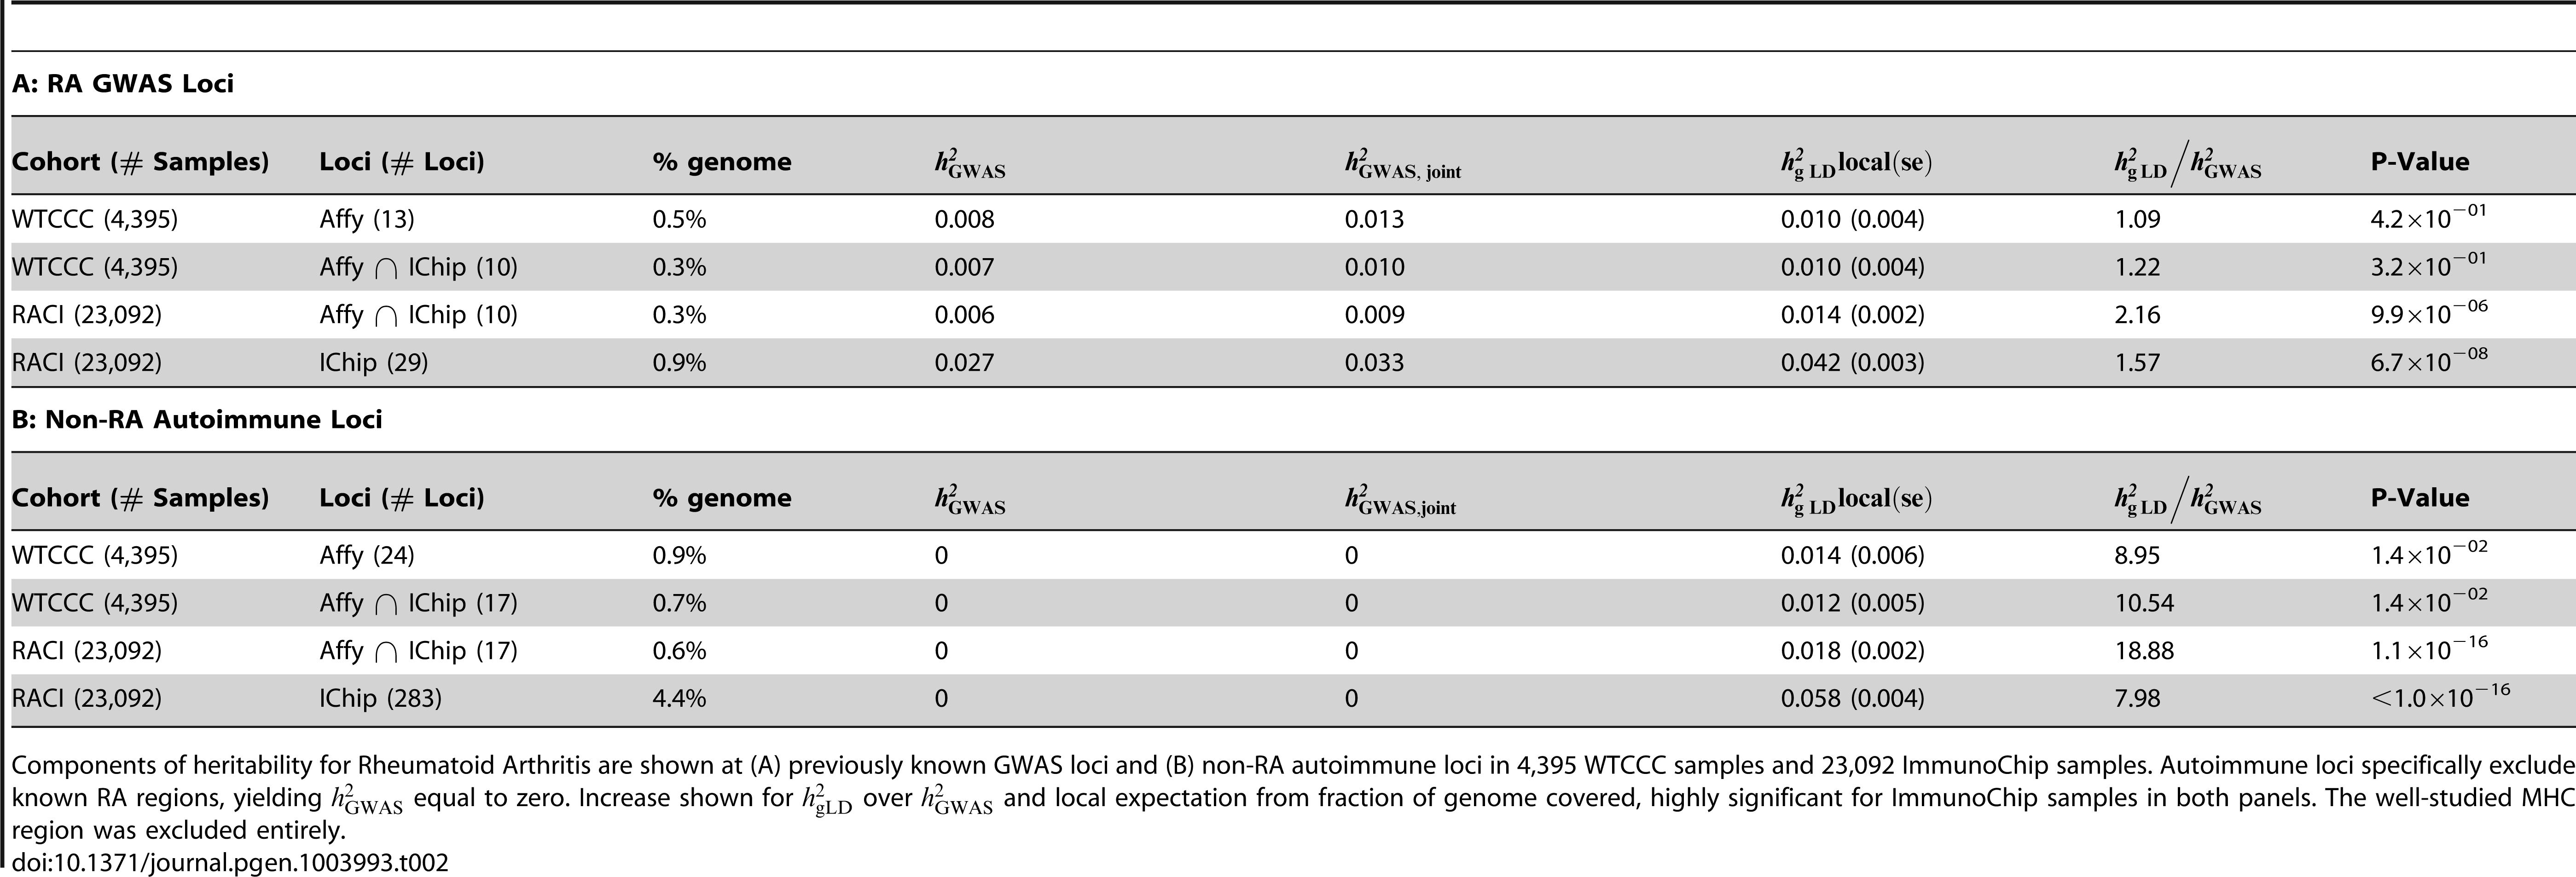 Replication of heritability of Rheumatoid Arthritis in ImmunoChip data.